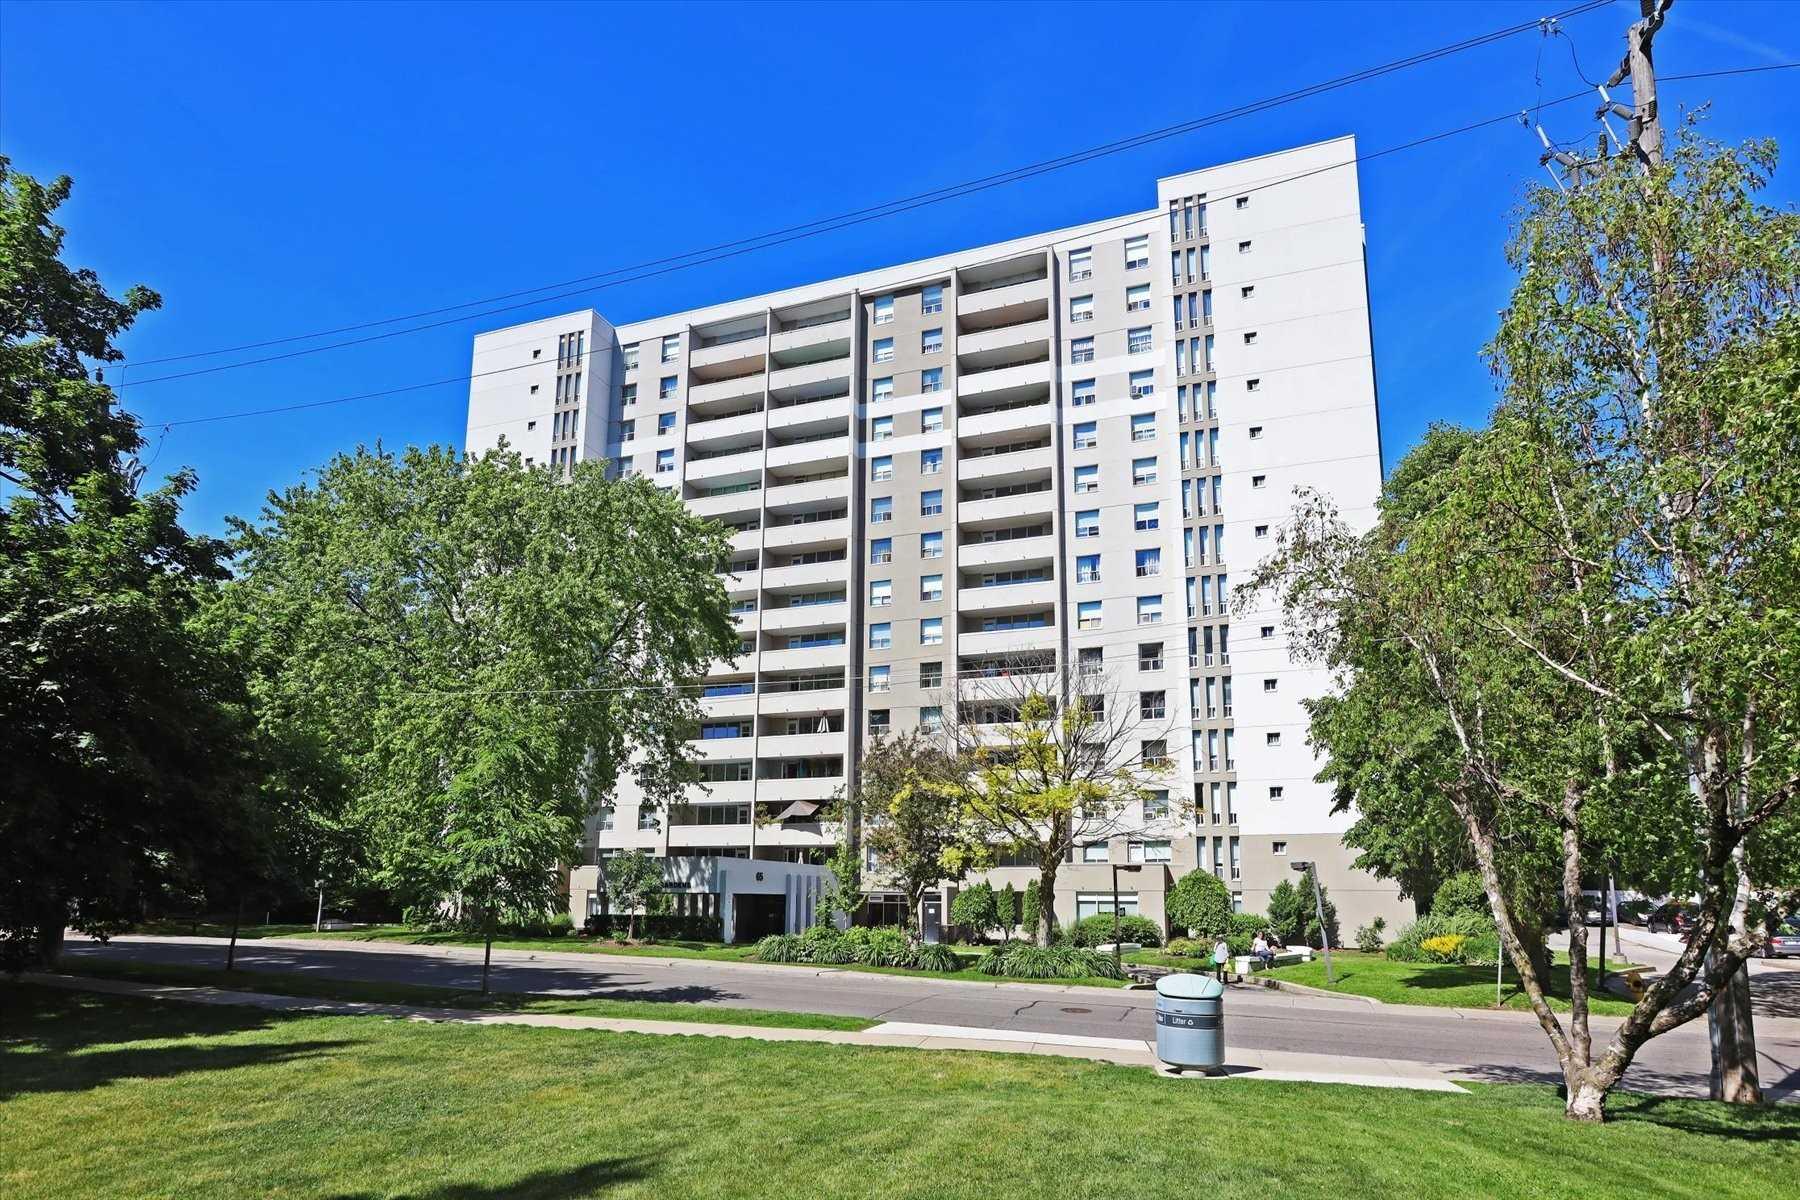 # 504 - 65 Southport St, Toronto, M6S3N6